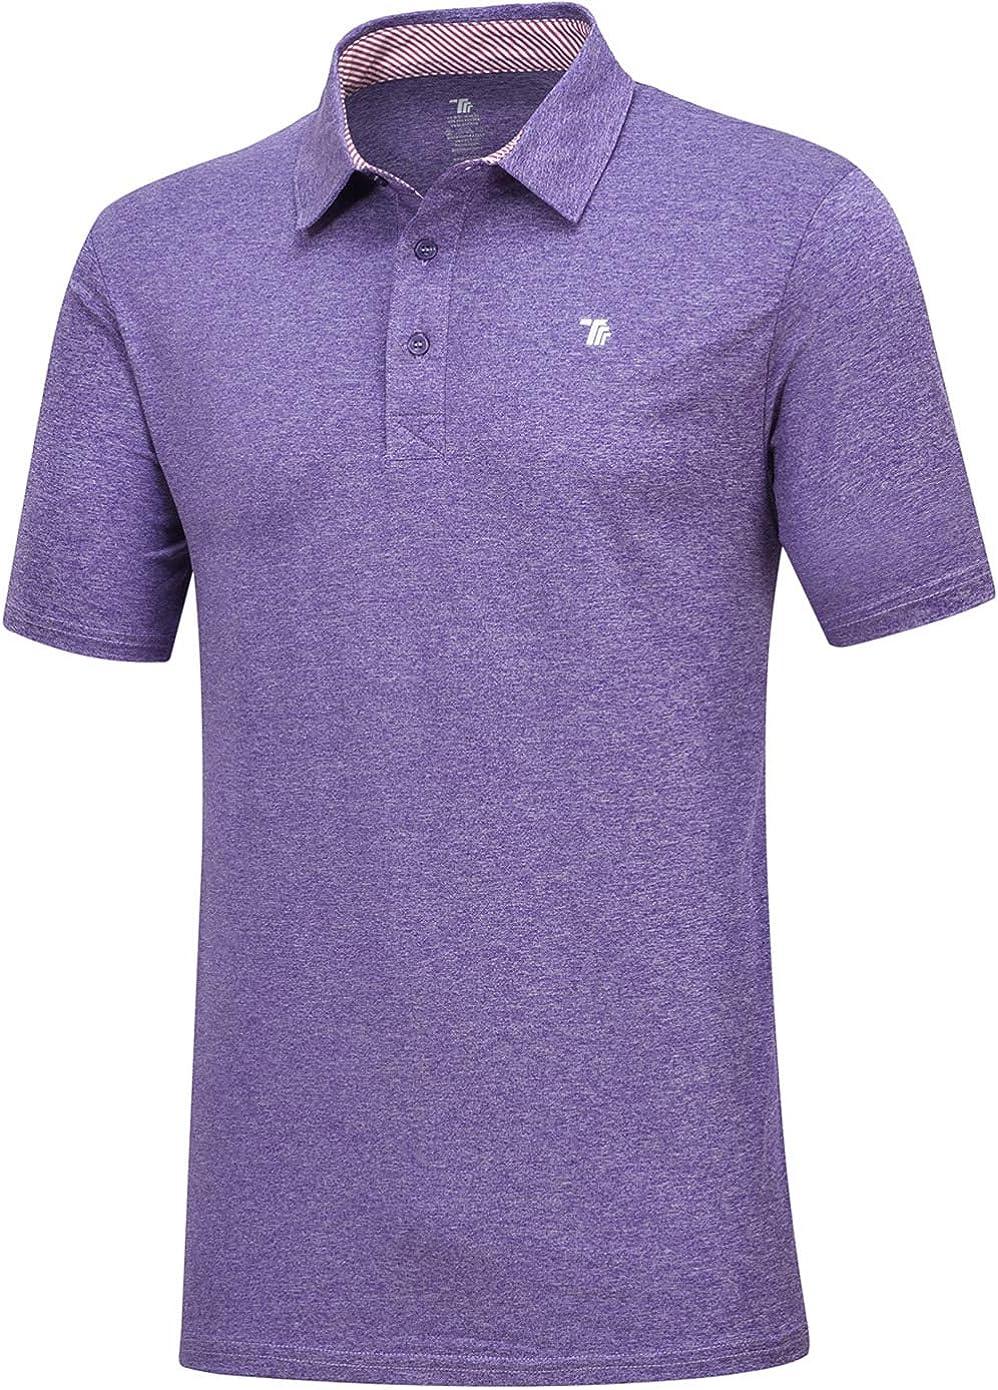 JINSHI Men's Golf Shirts Short Sleeve Polo Shirts Casual Dry Fit Athletic Shirts Tee